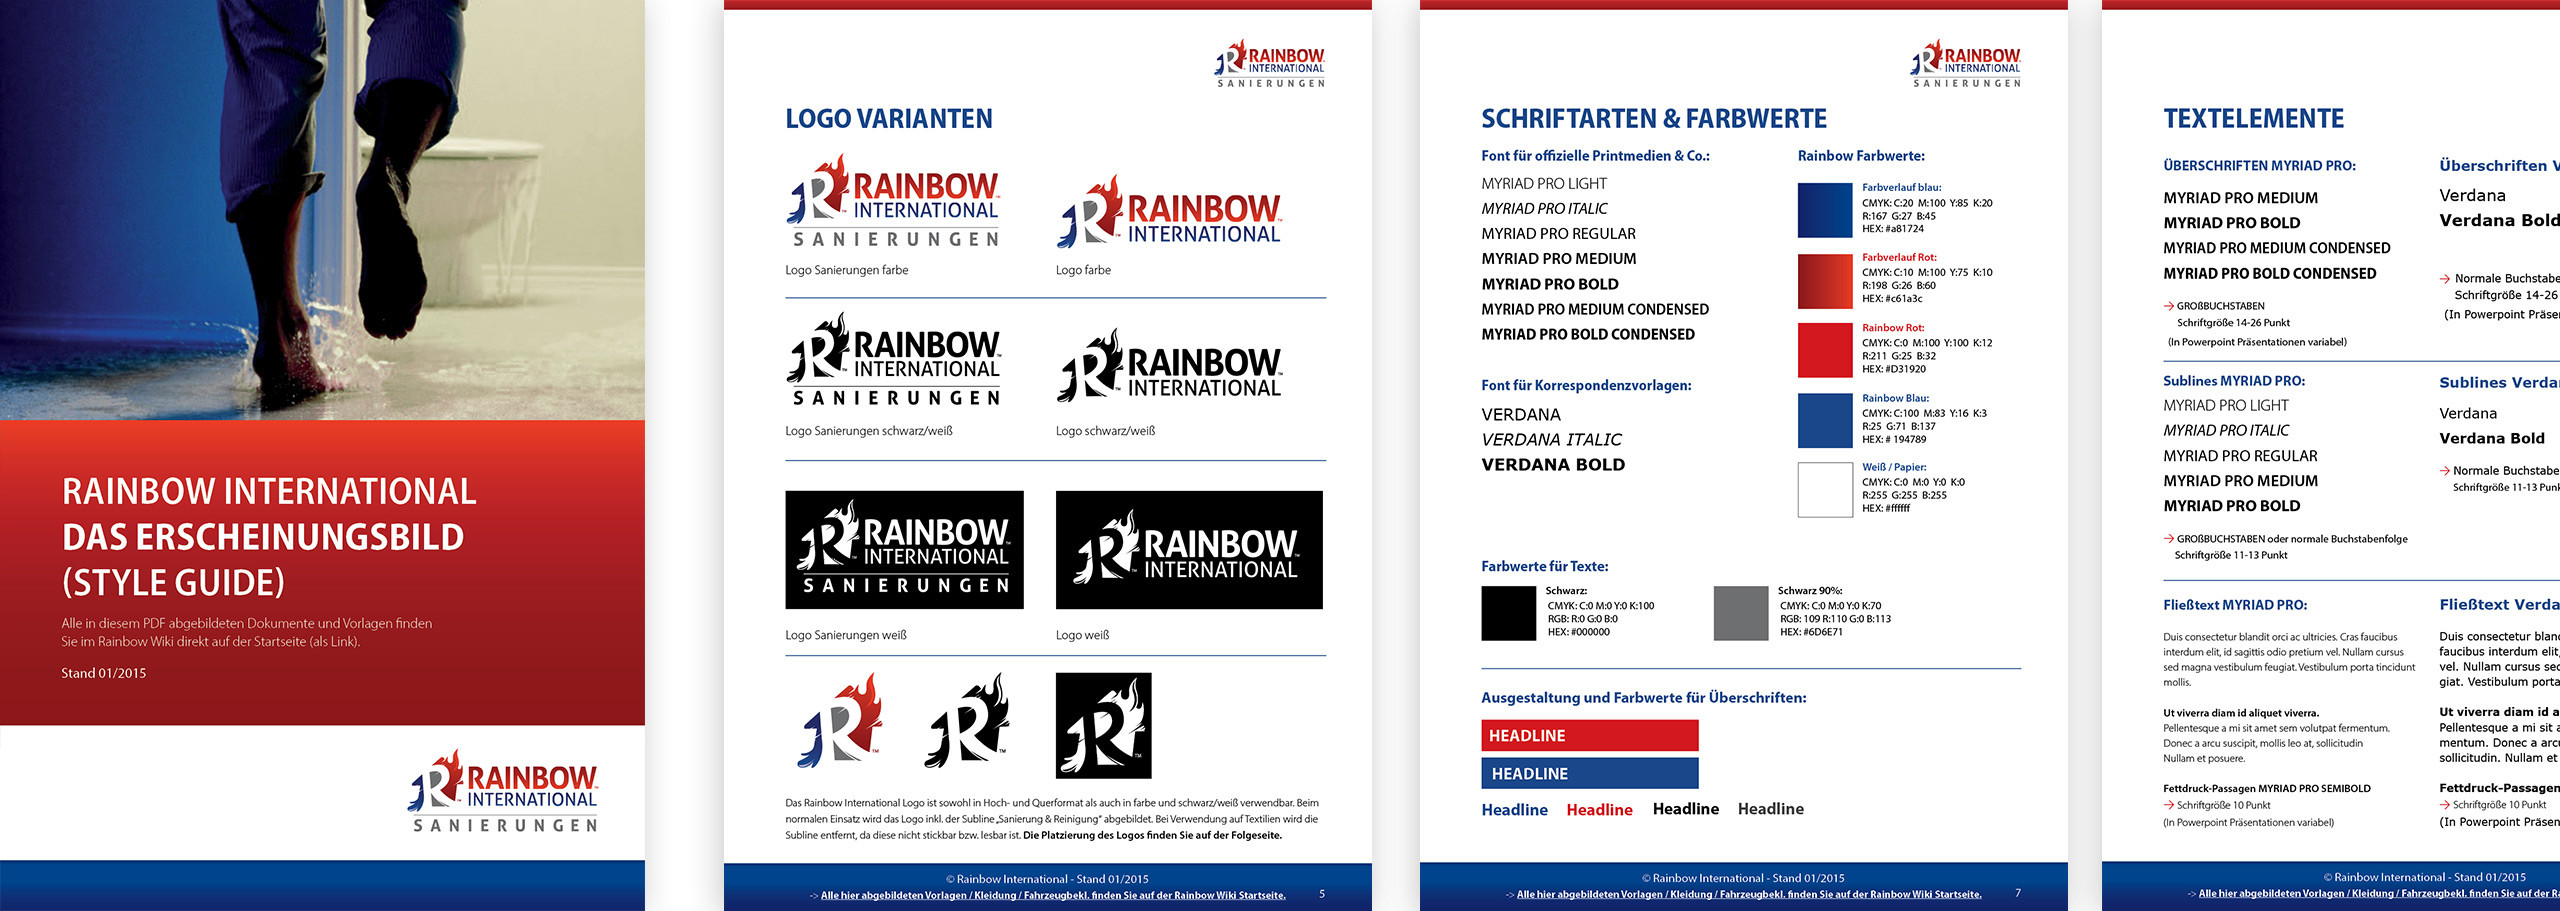 Rainbow International In Neuem Gewand Rainbow International